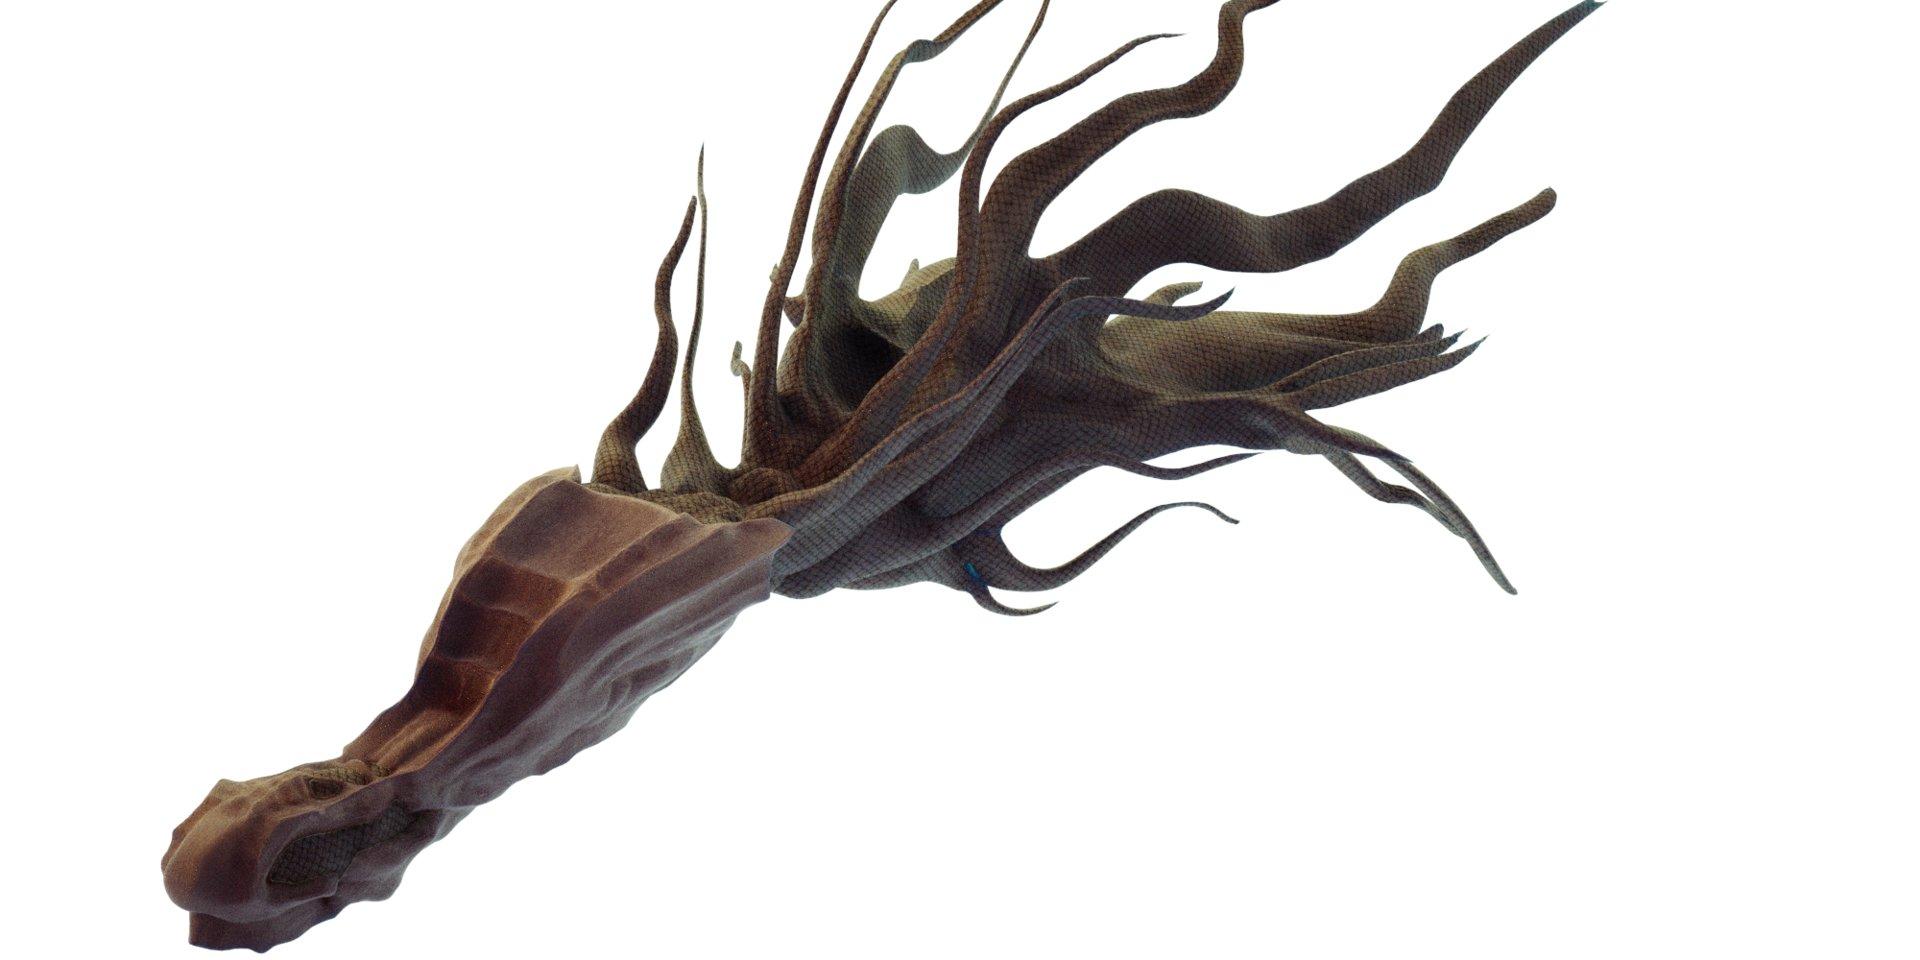 Kresimir jelusic fishy8